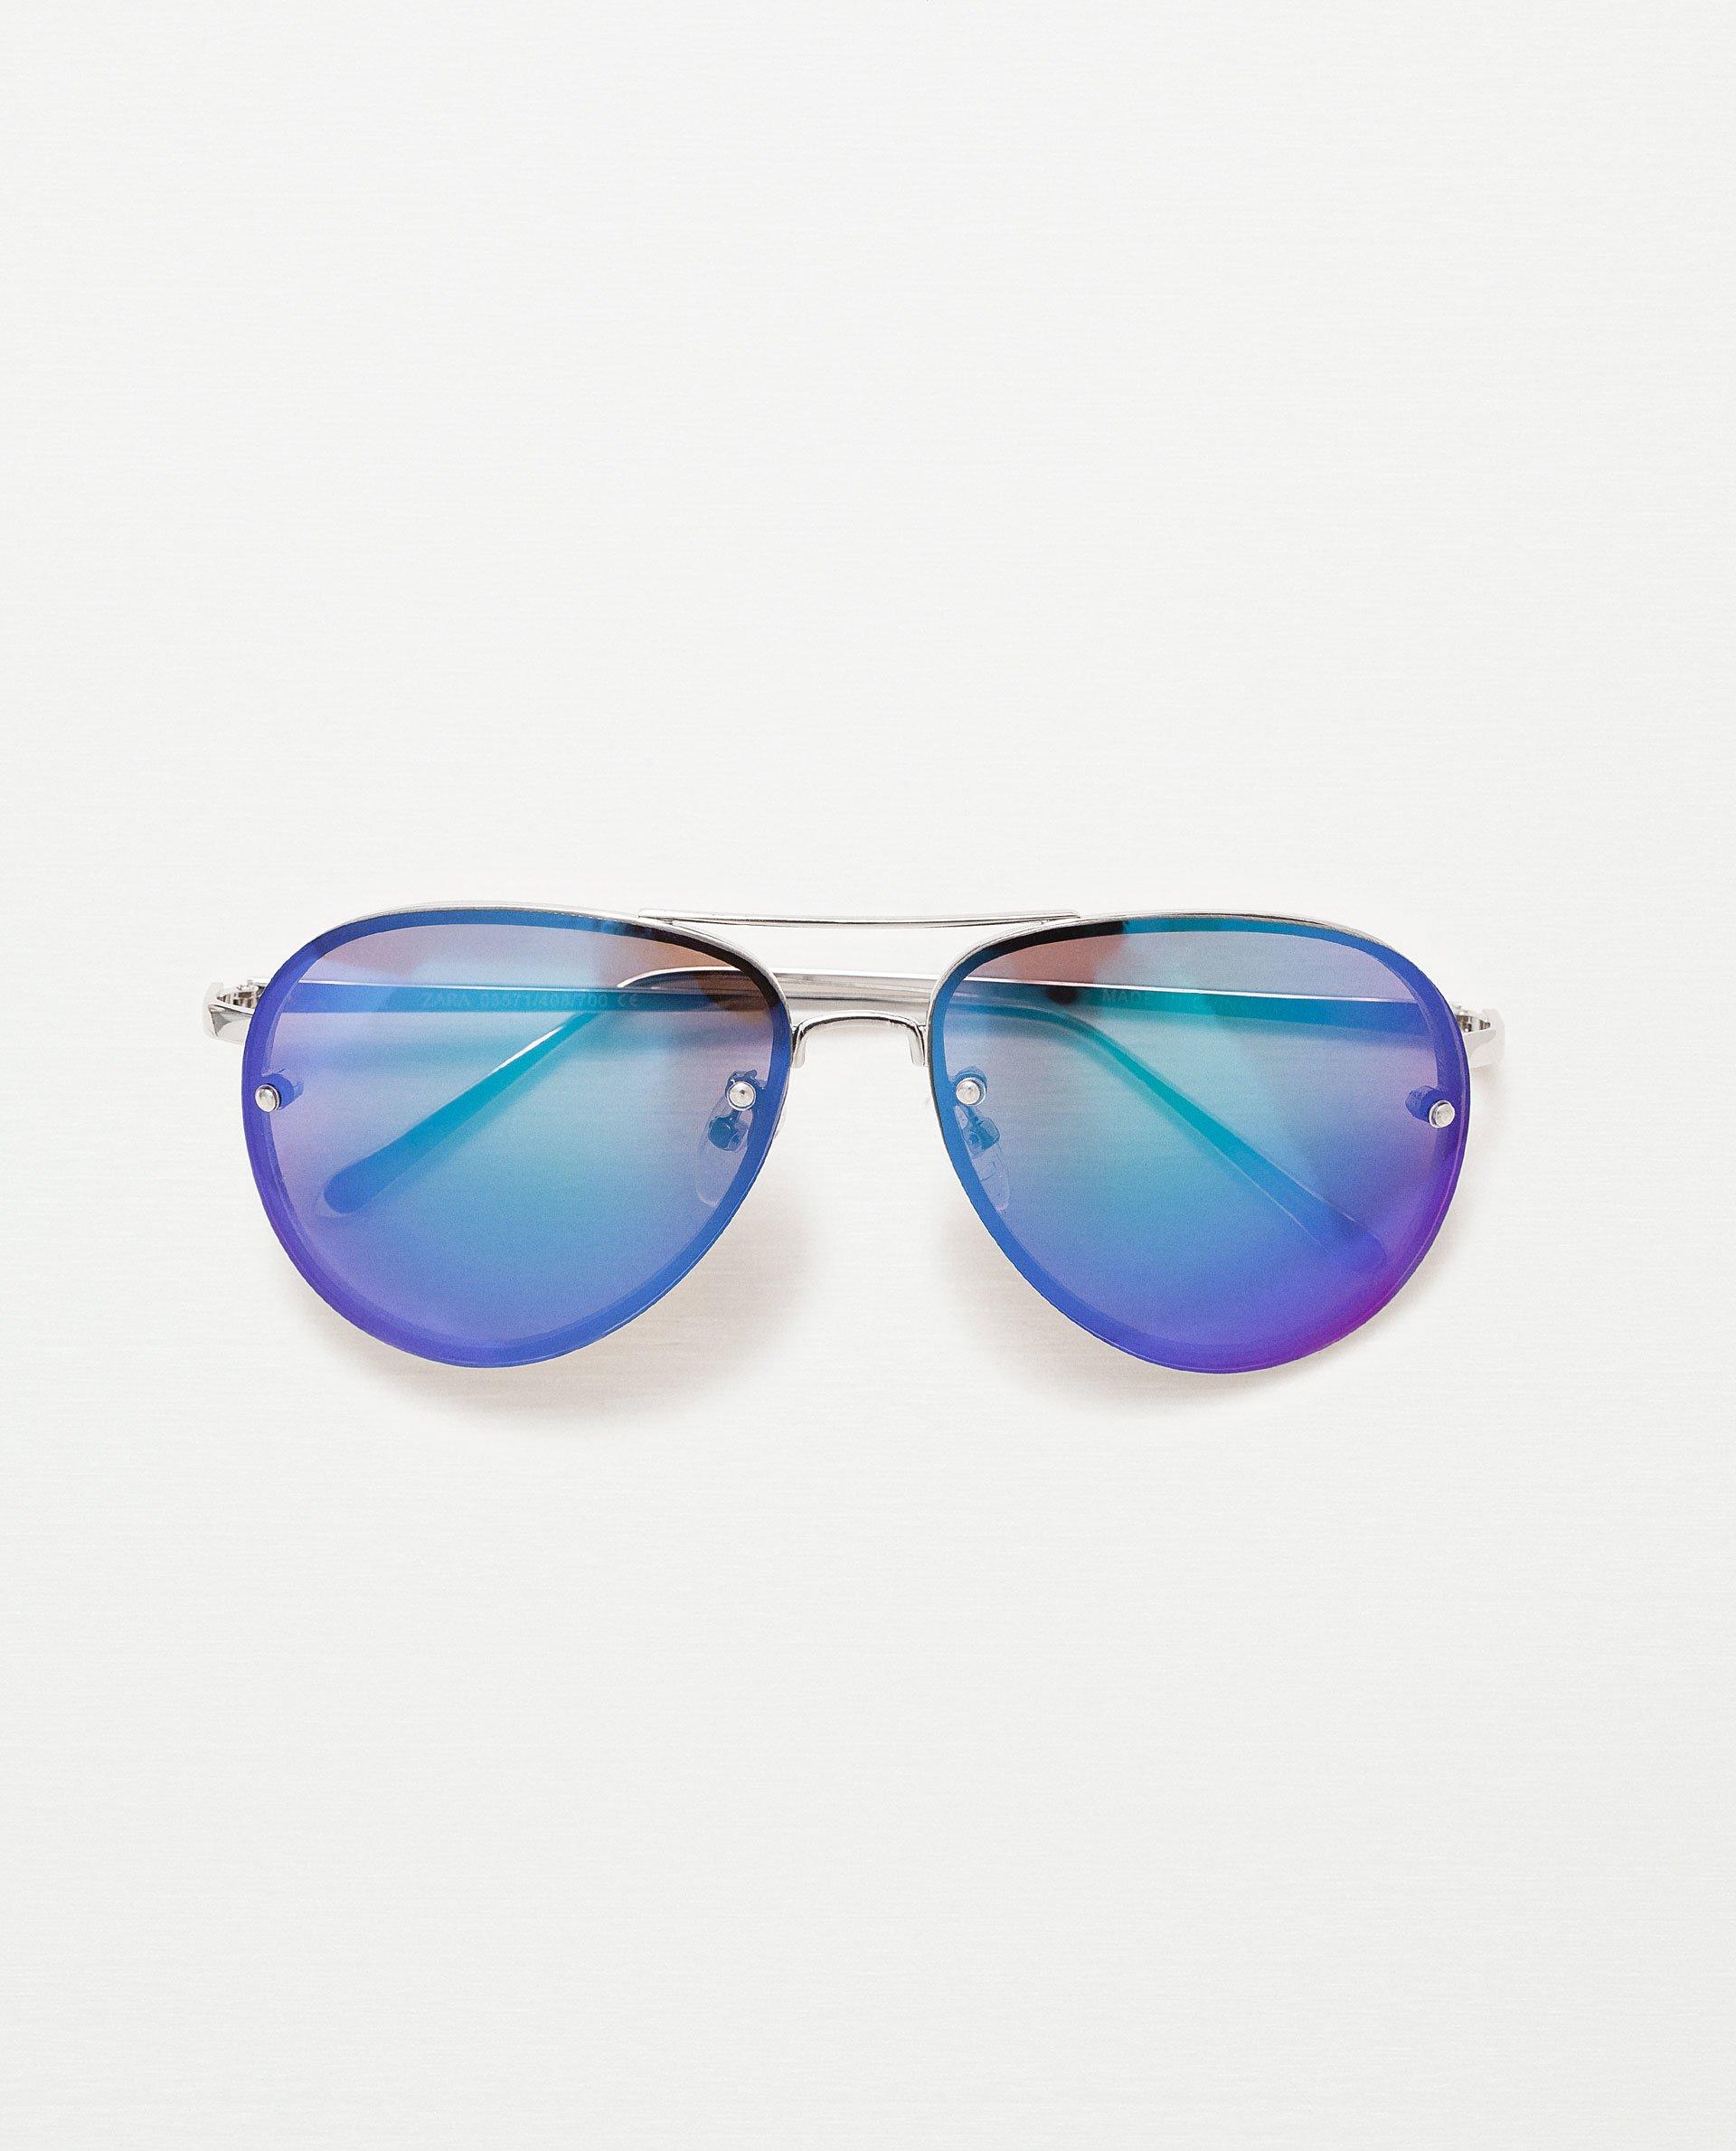 Blue Tinted Aviator Sunglasses  zara blue tint aviator sunglasses blue tint aviator sunglasses in